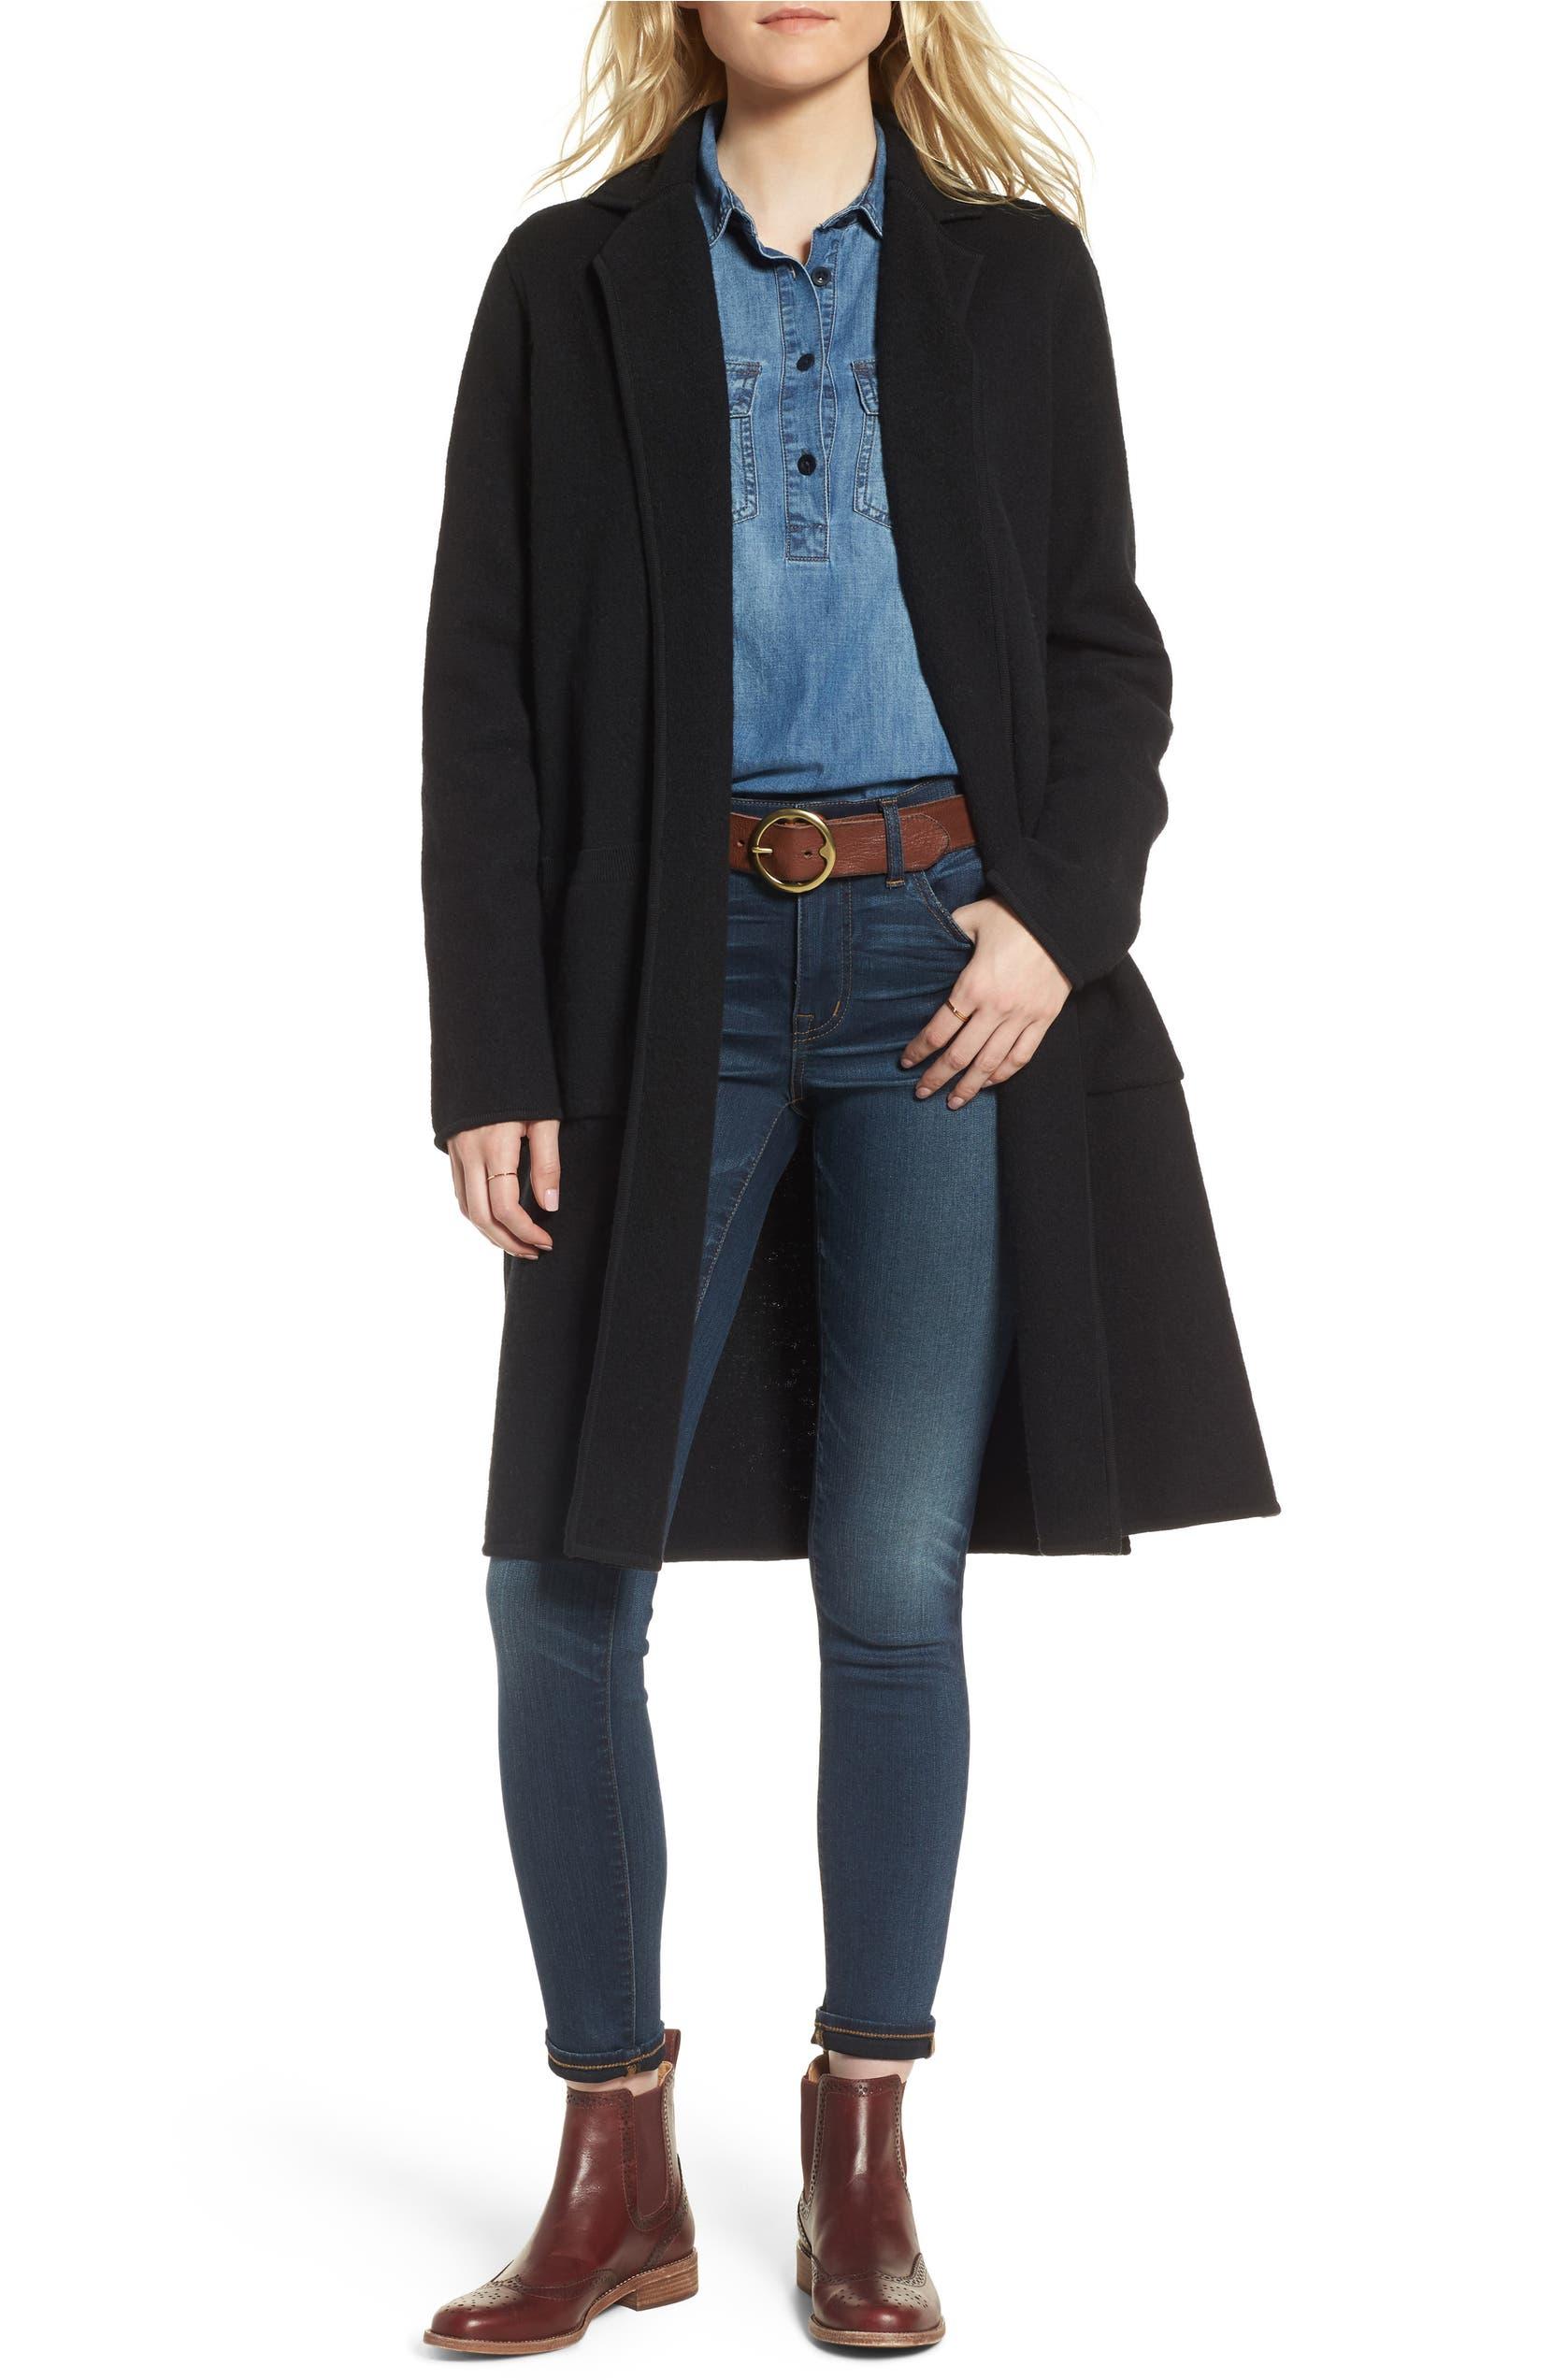 Madewell Camden Sweater Coat  c4d82be0156d